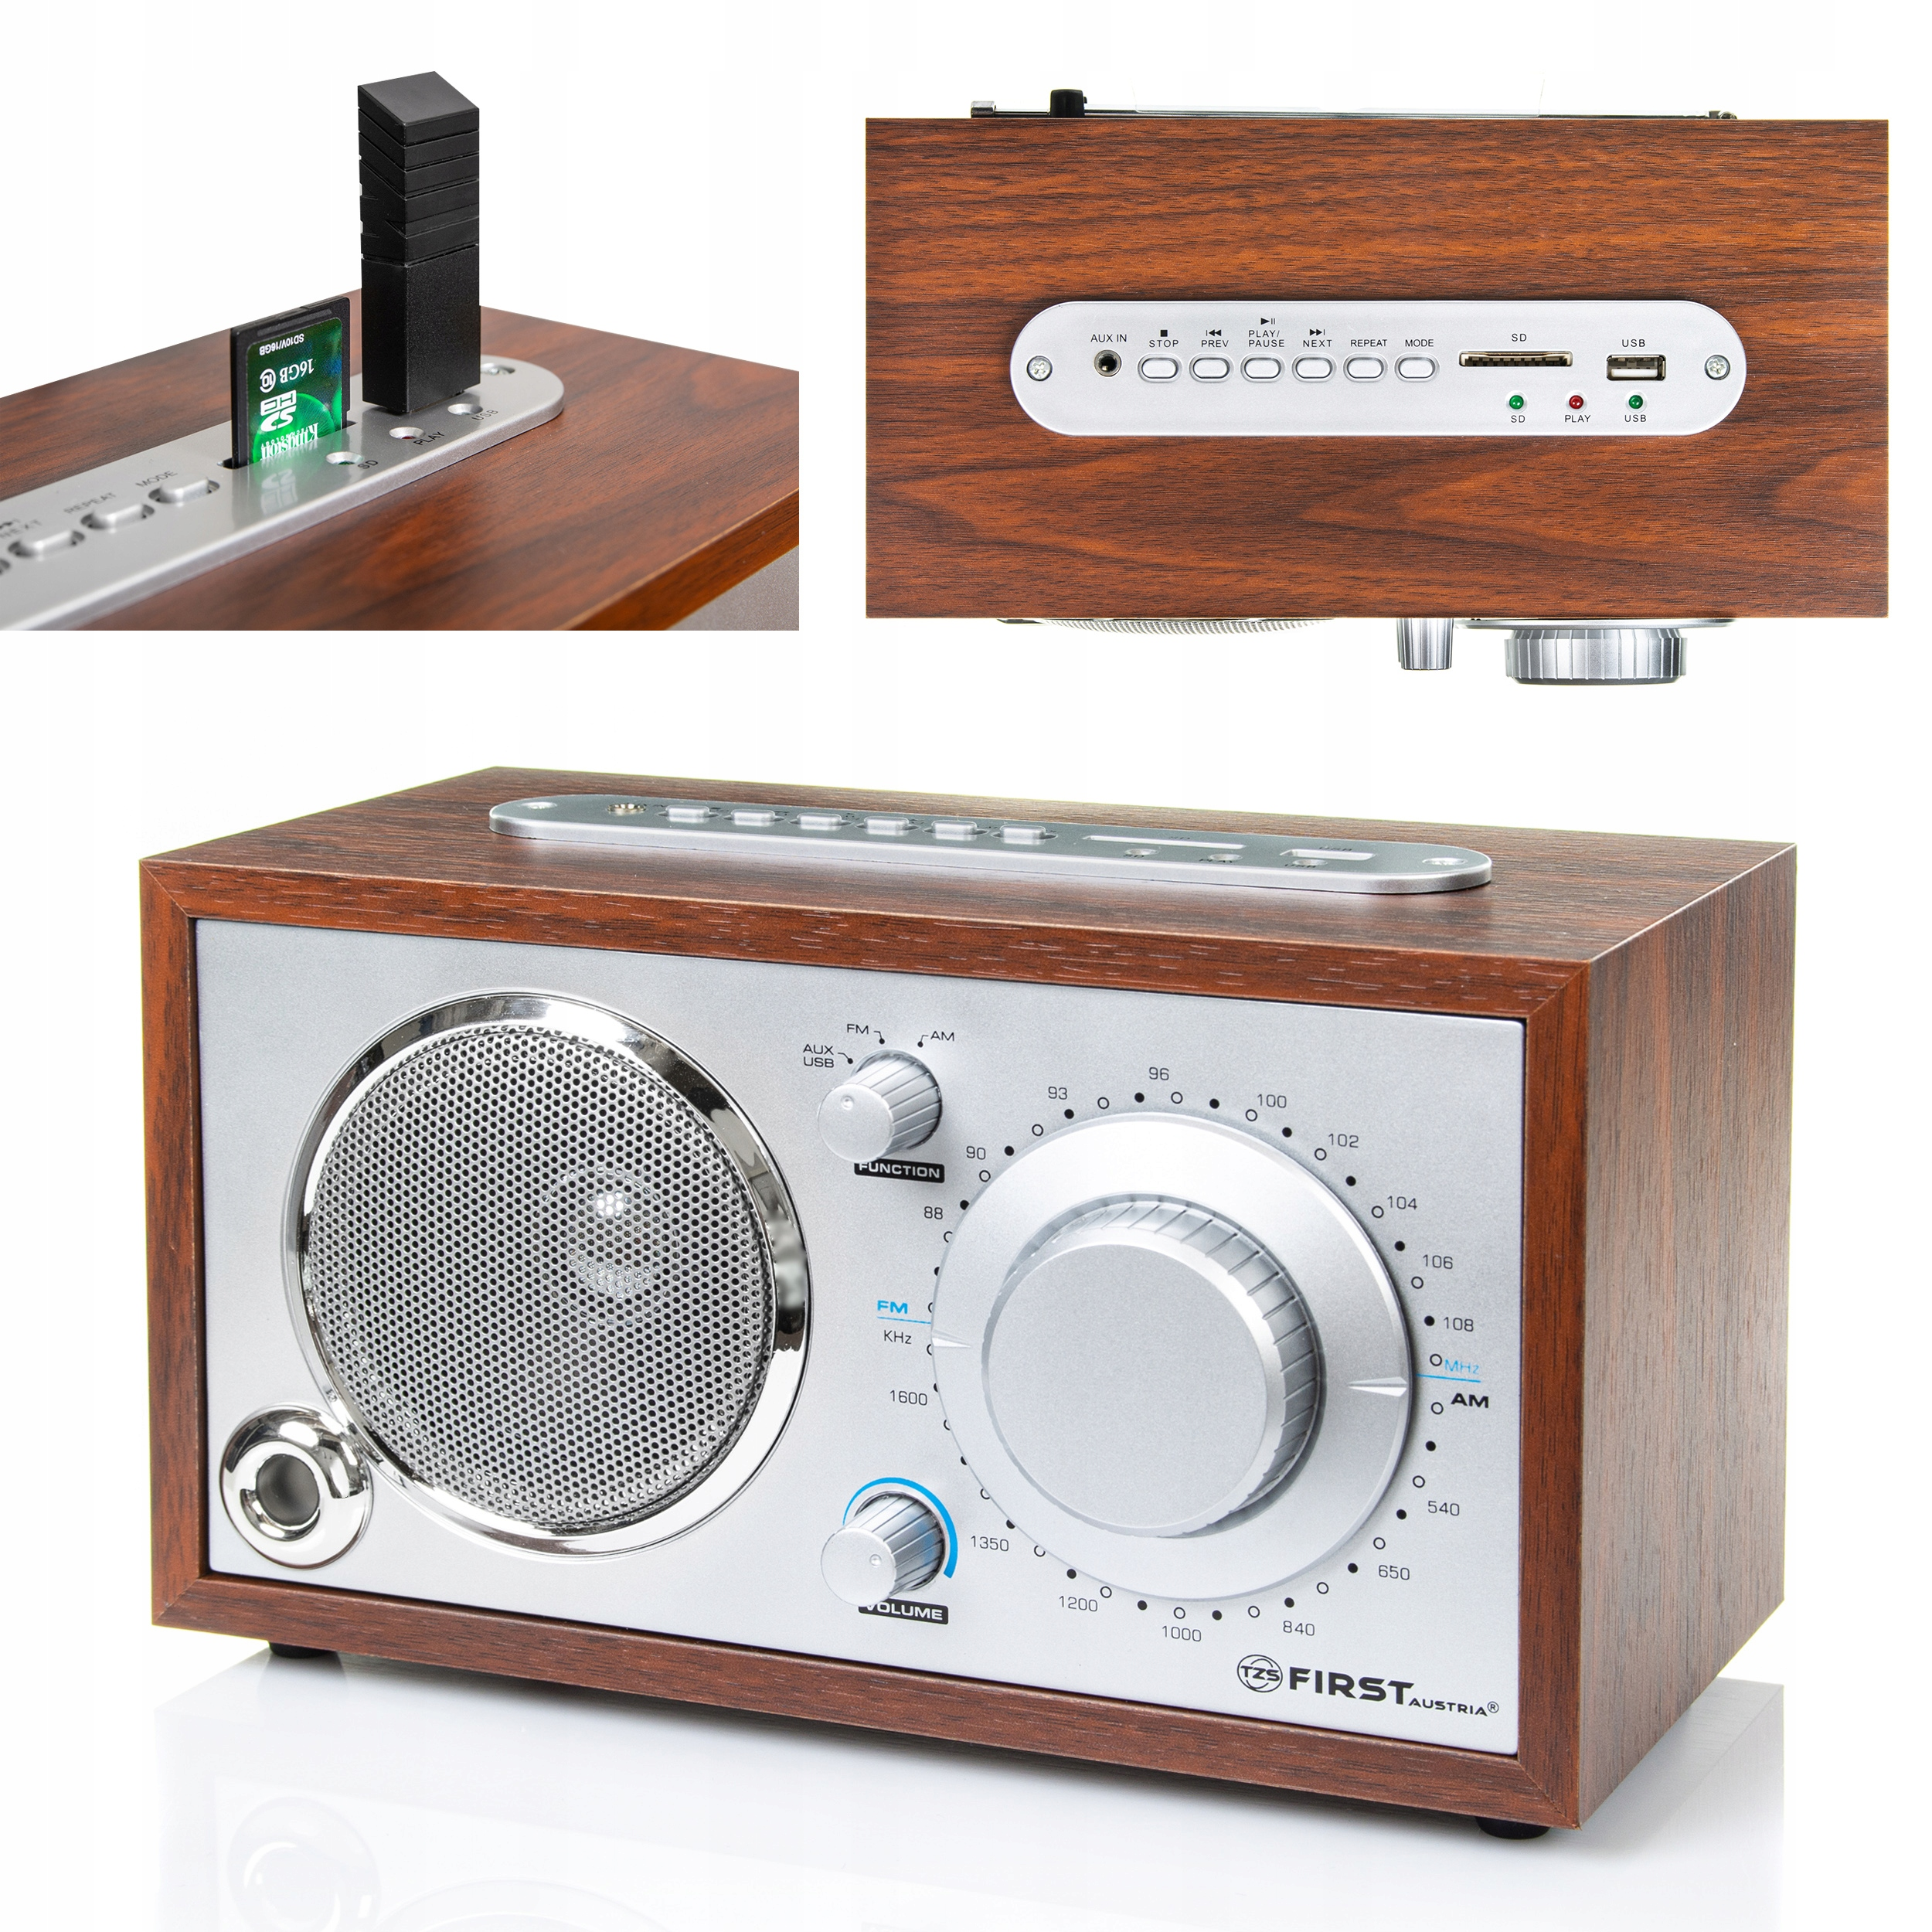 Радио Ретро Классик USB SD WOOD First Австрия